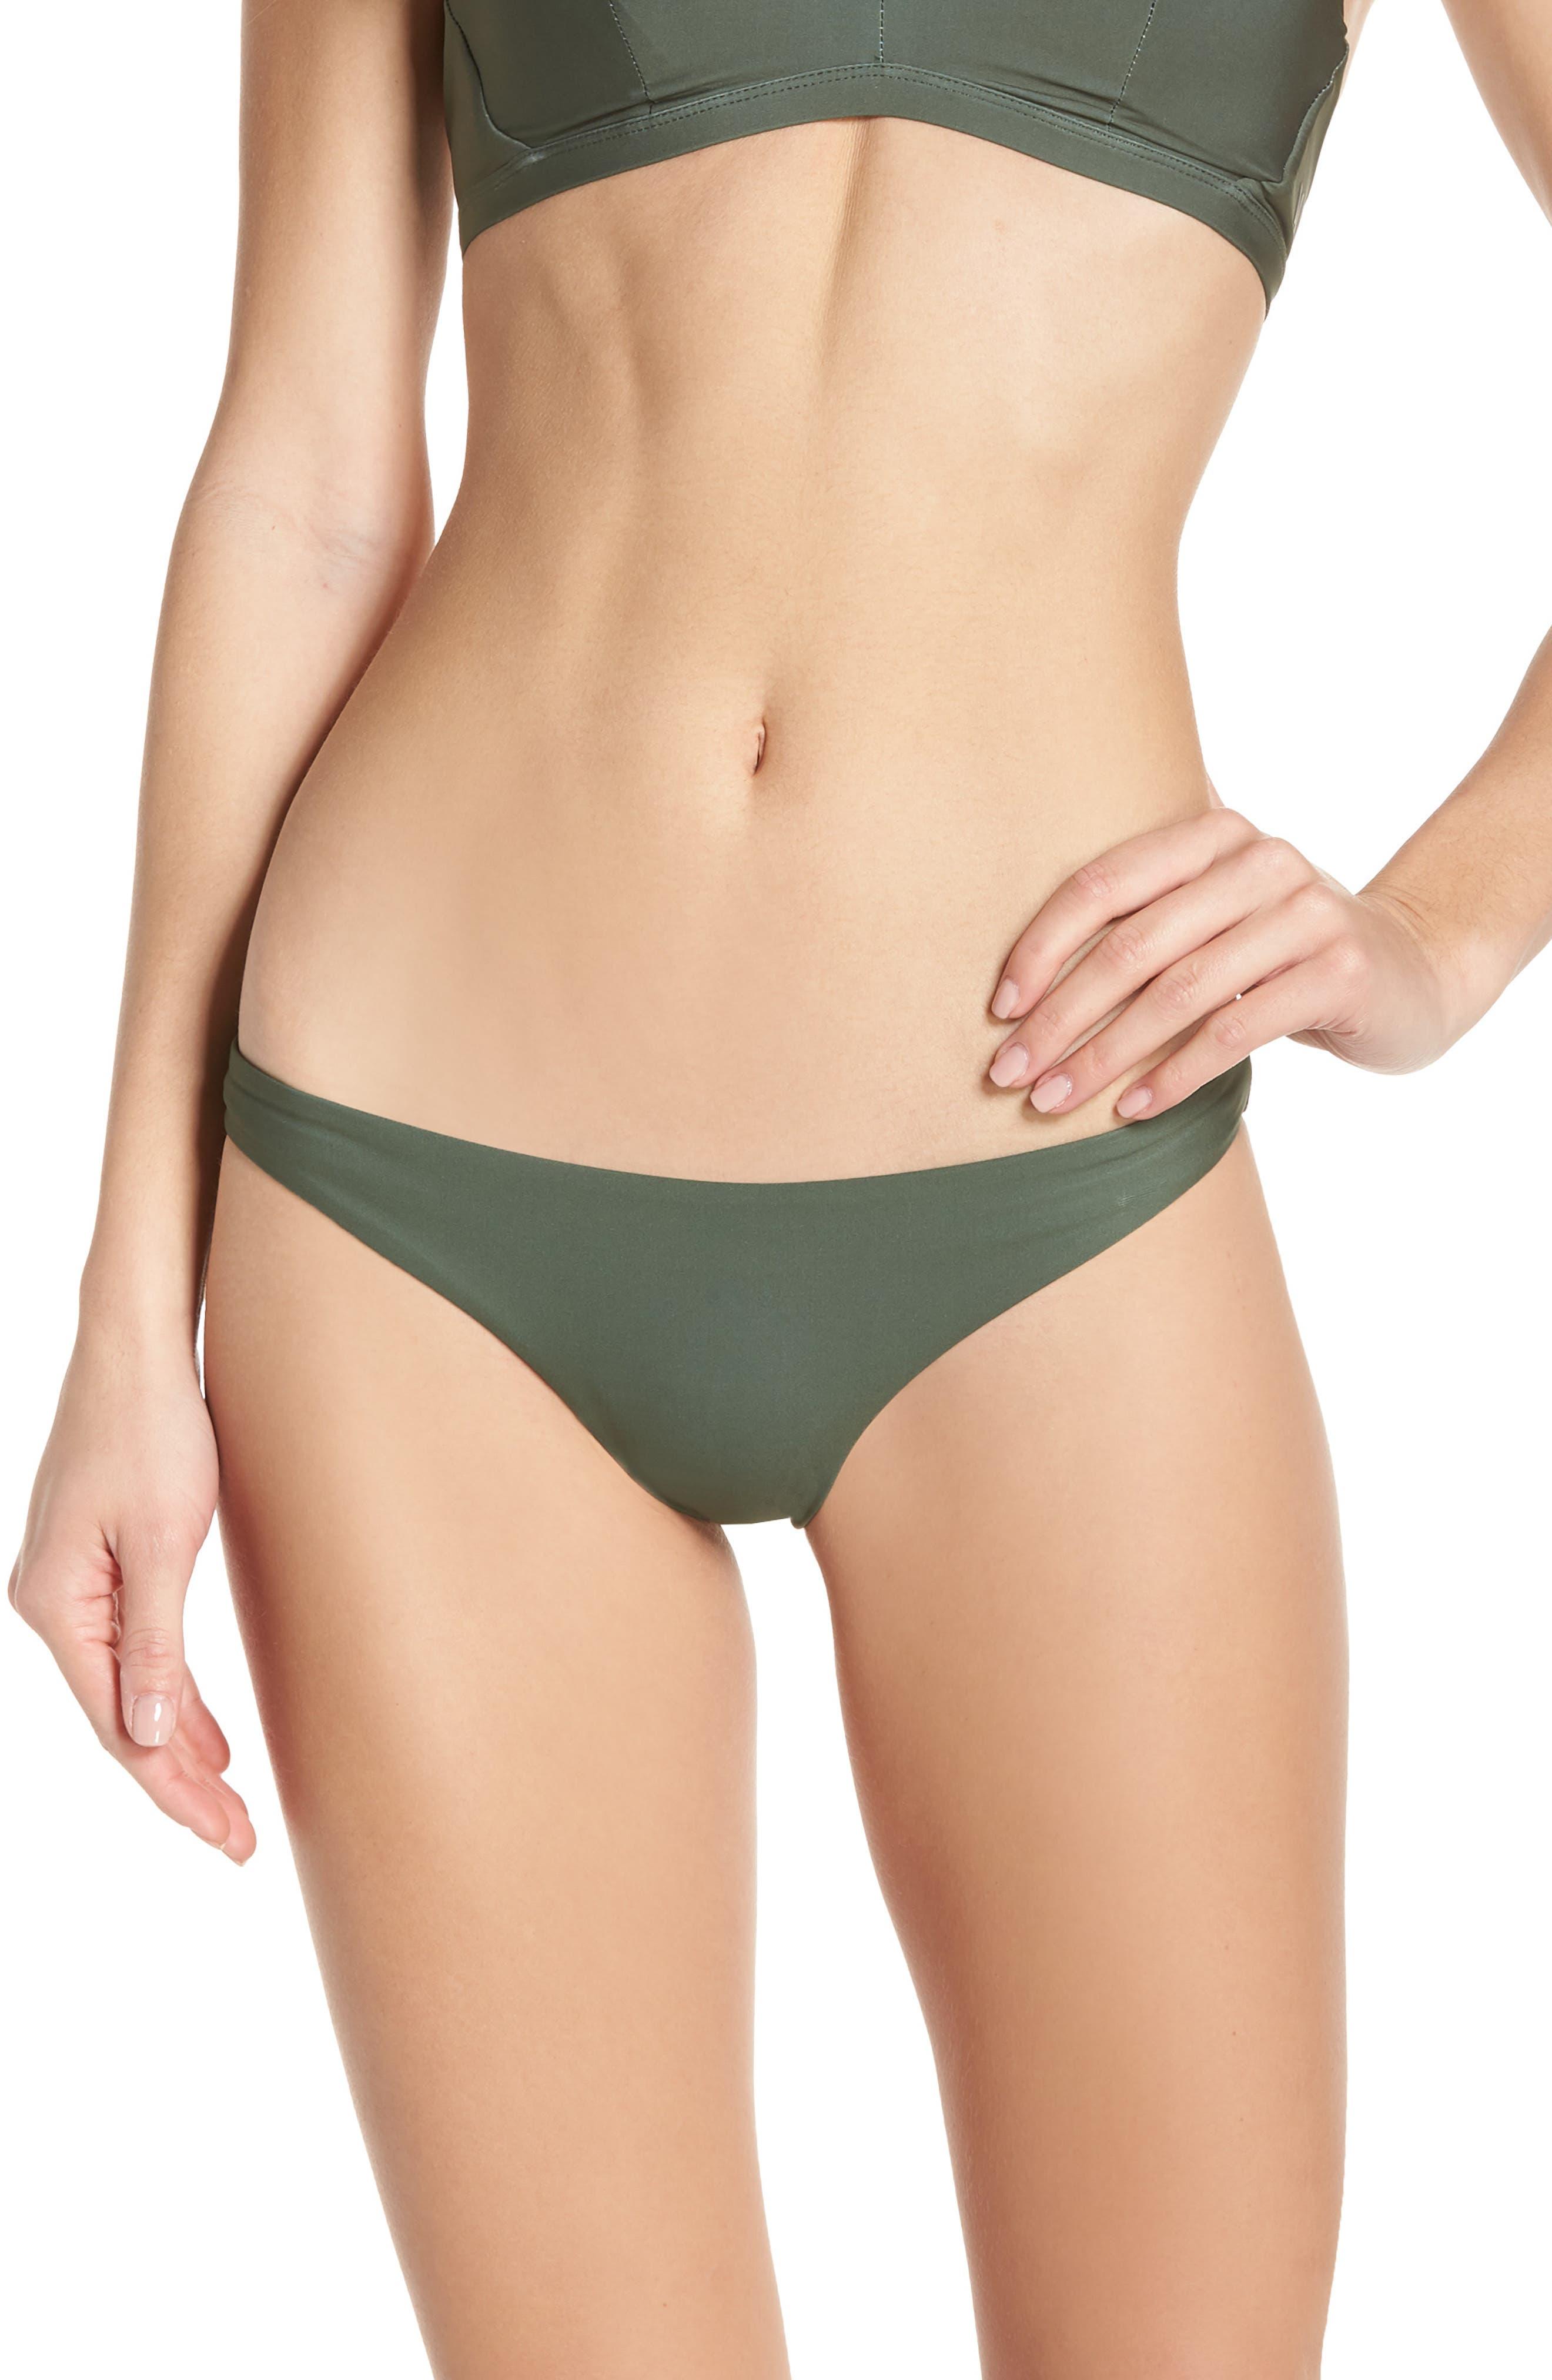 Hurley X Pendleton Quick Dry Badlands Bikini Bottoms, Green